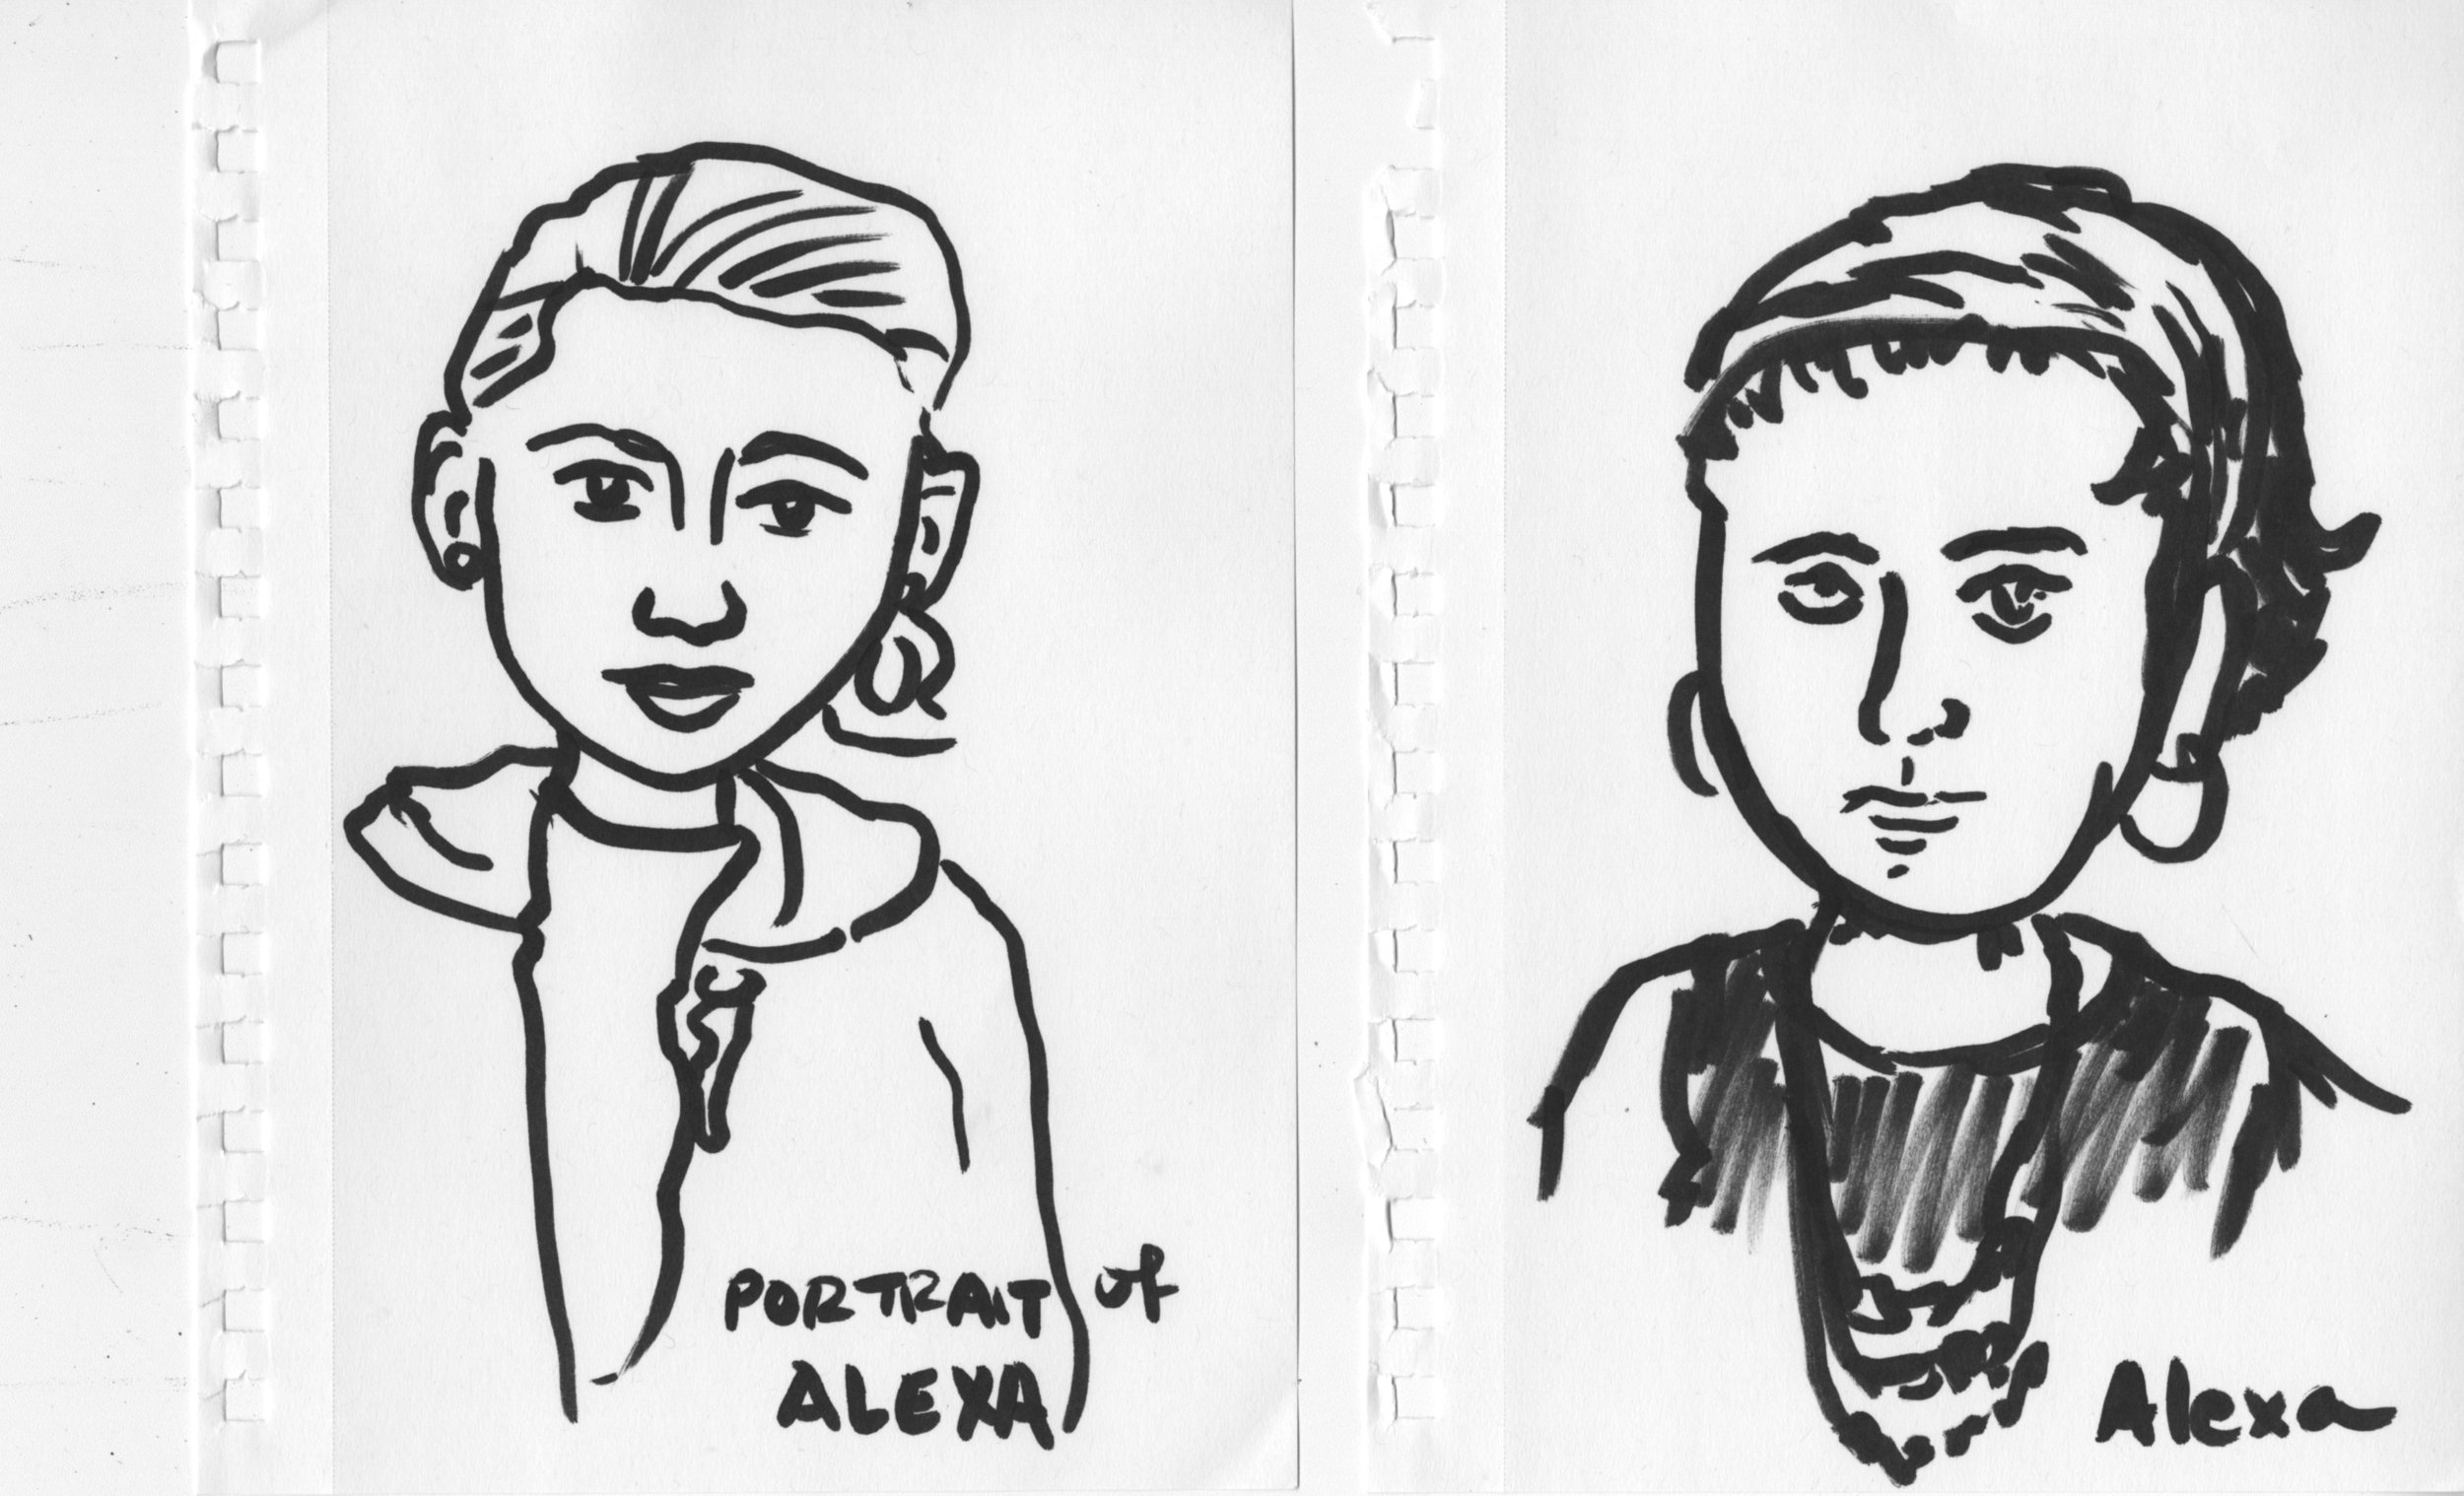 20_Alexa Kullinski_Portrait of Alexa.jpg